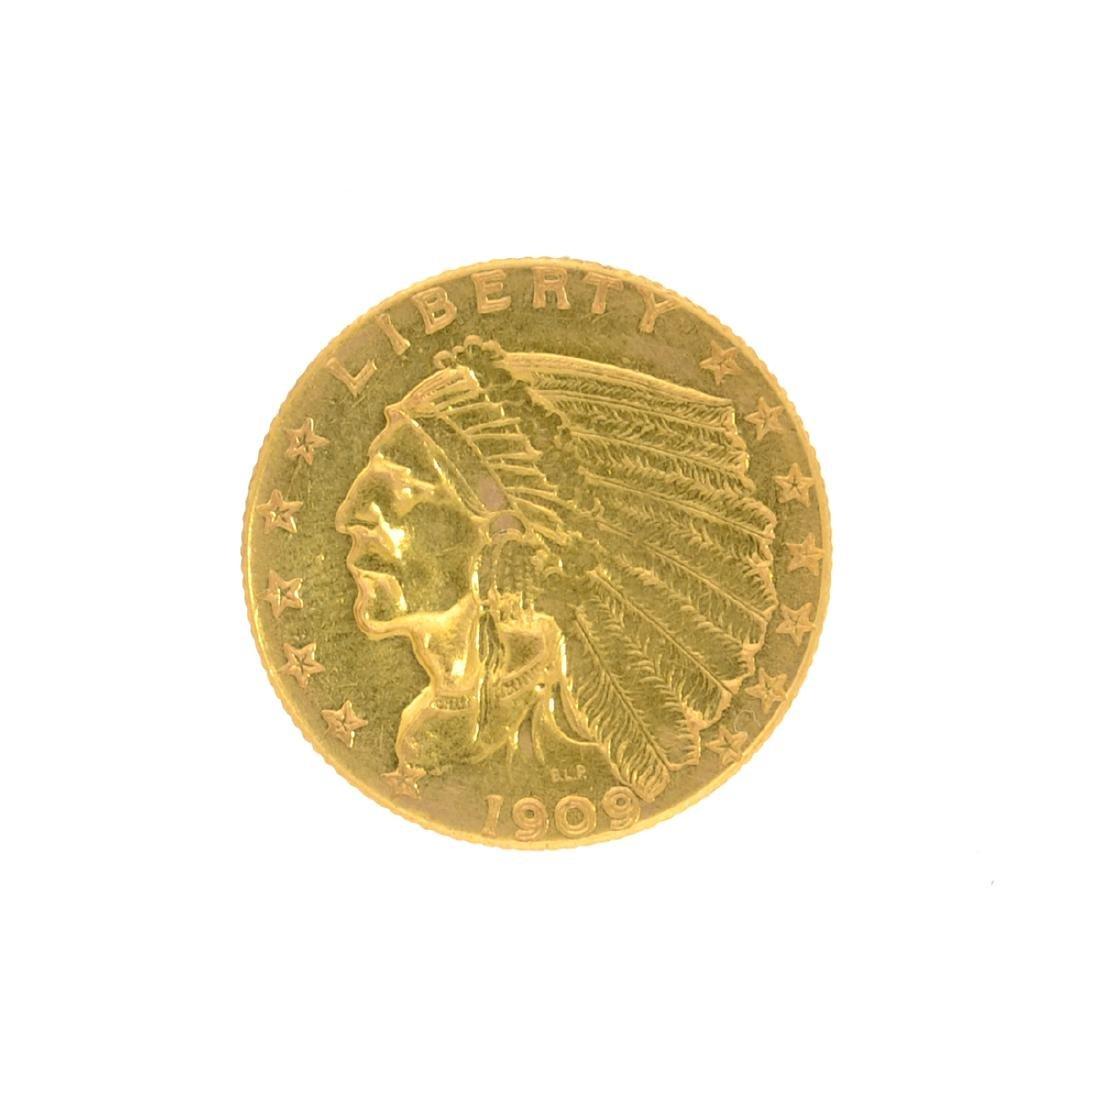 *1909 $2.50 U.S. Indian Head Gold Coin (JG N)